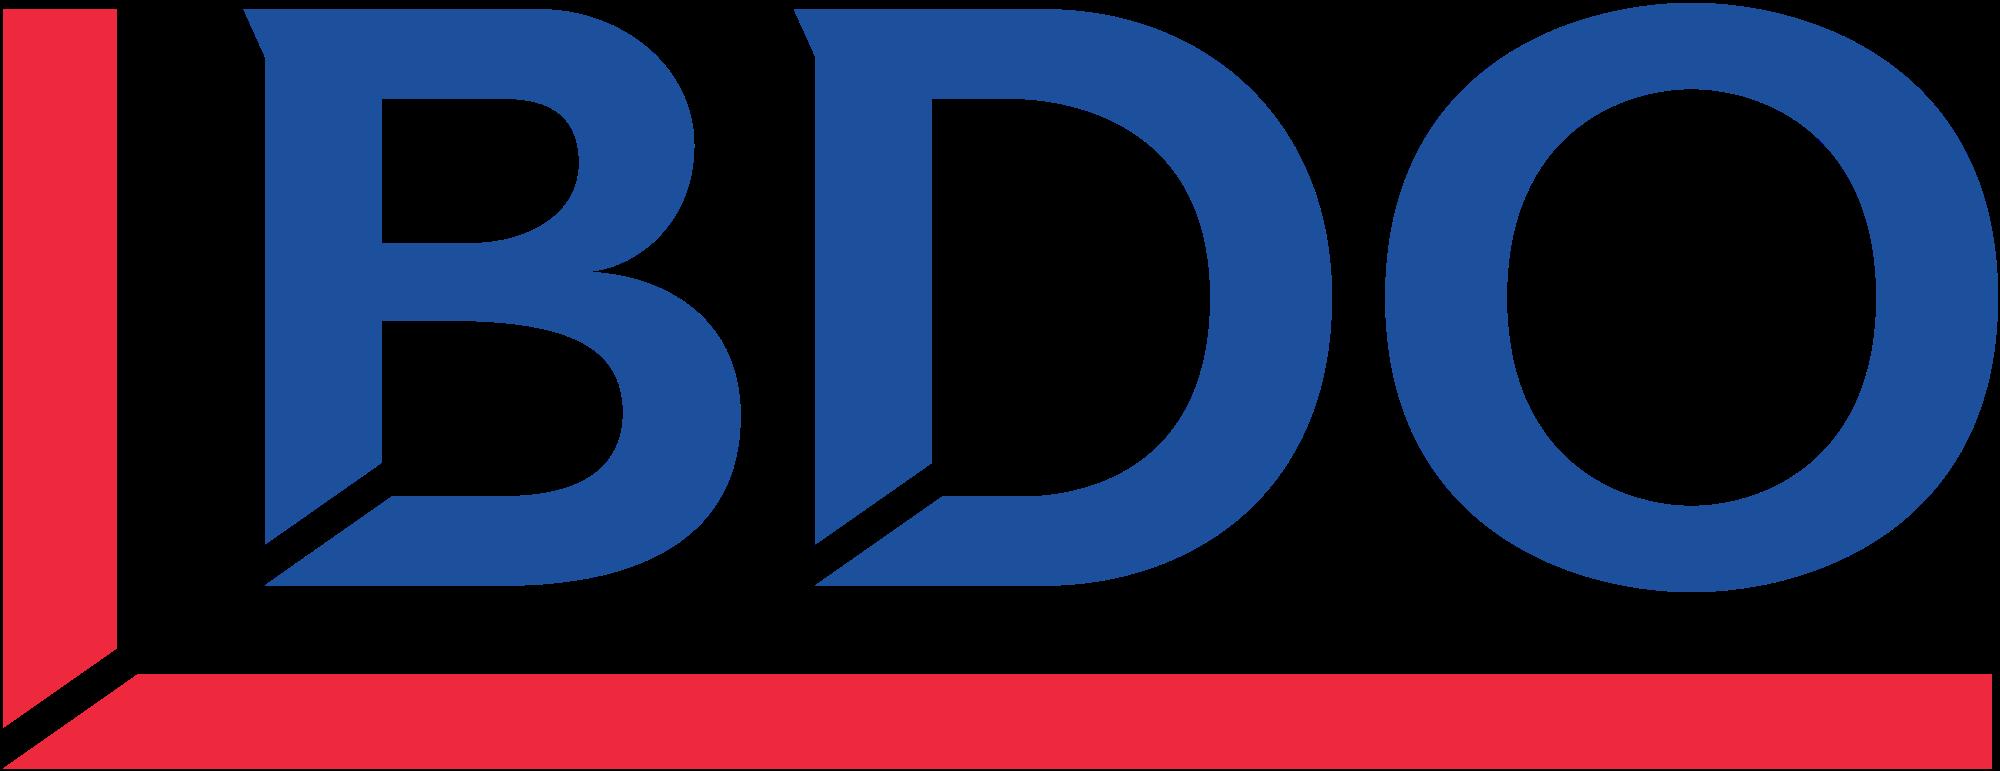 BDO Australia Uses TalentVine As Their Recruitment Platform